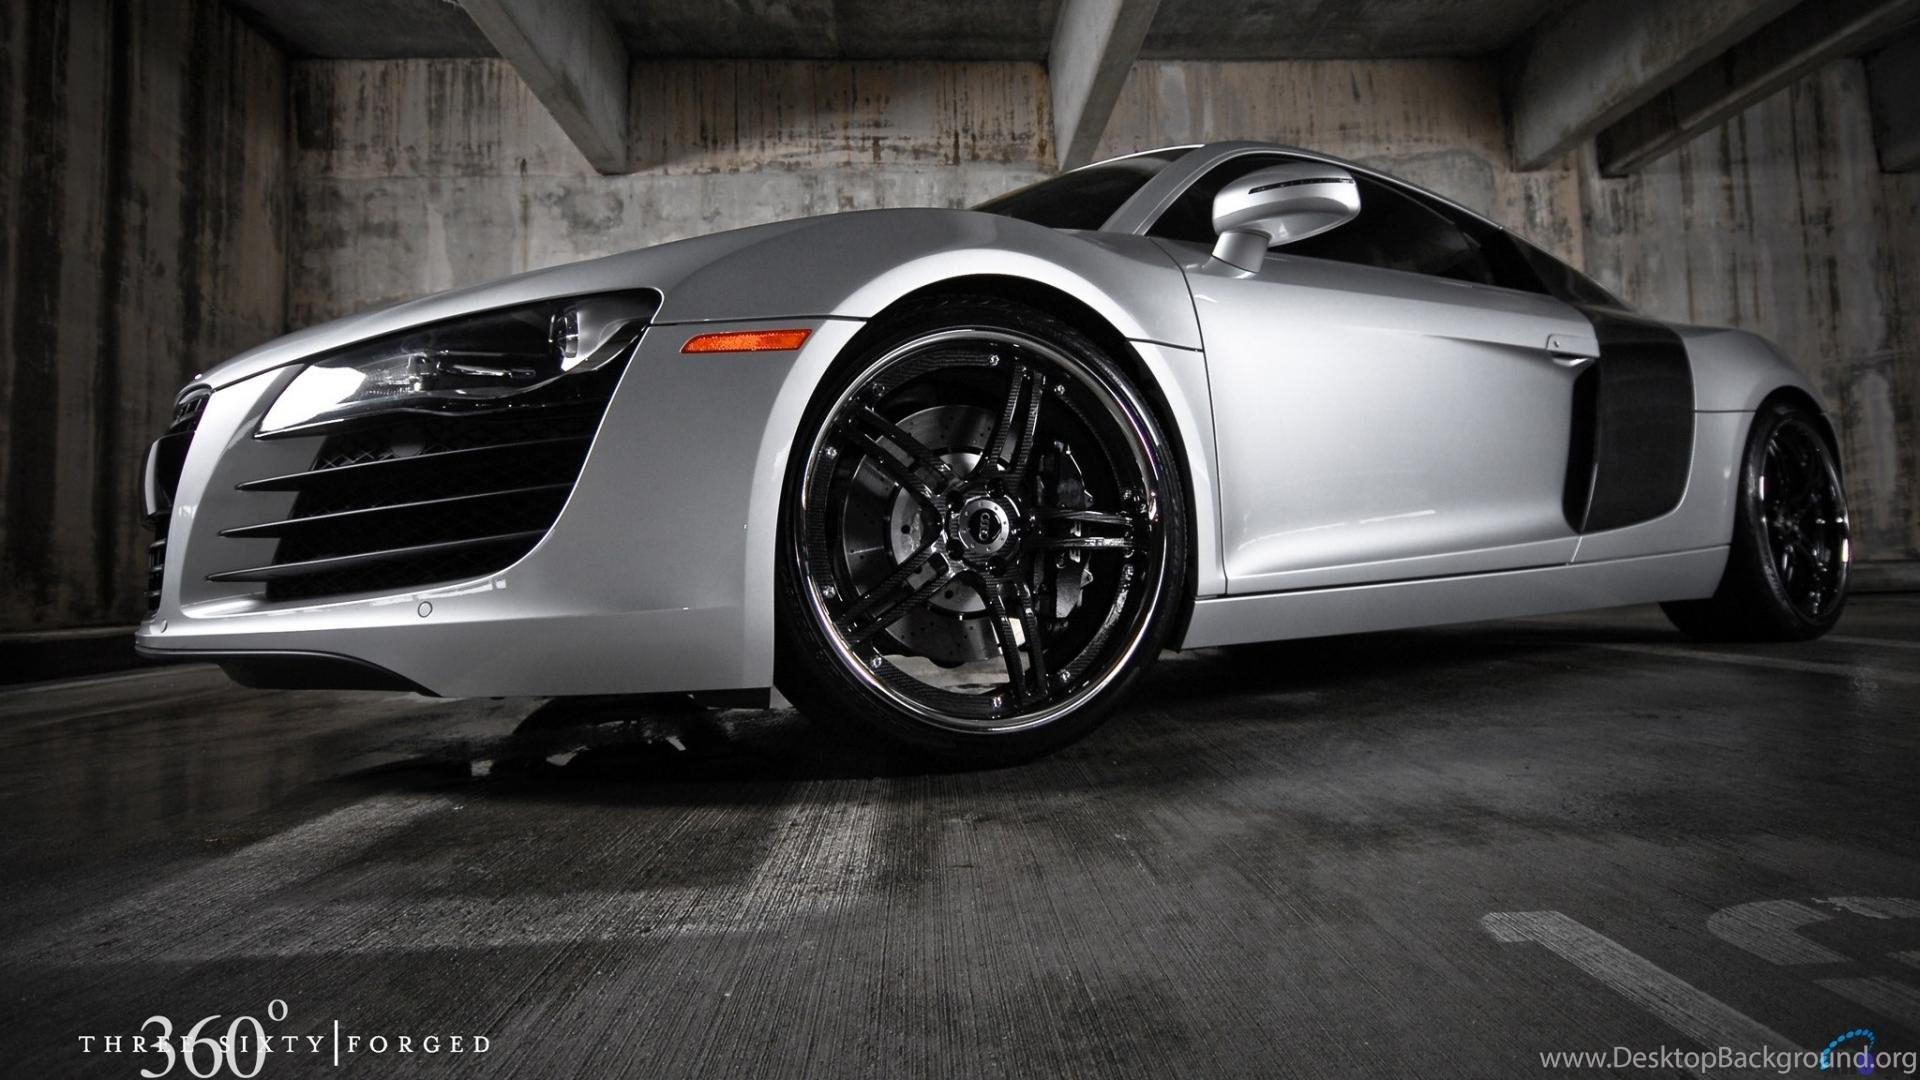 Download Wallpapers Audi R8 460cv 1920 X 1080 Hdtv 1080p Desktop